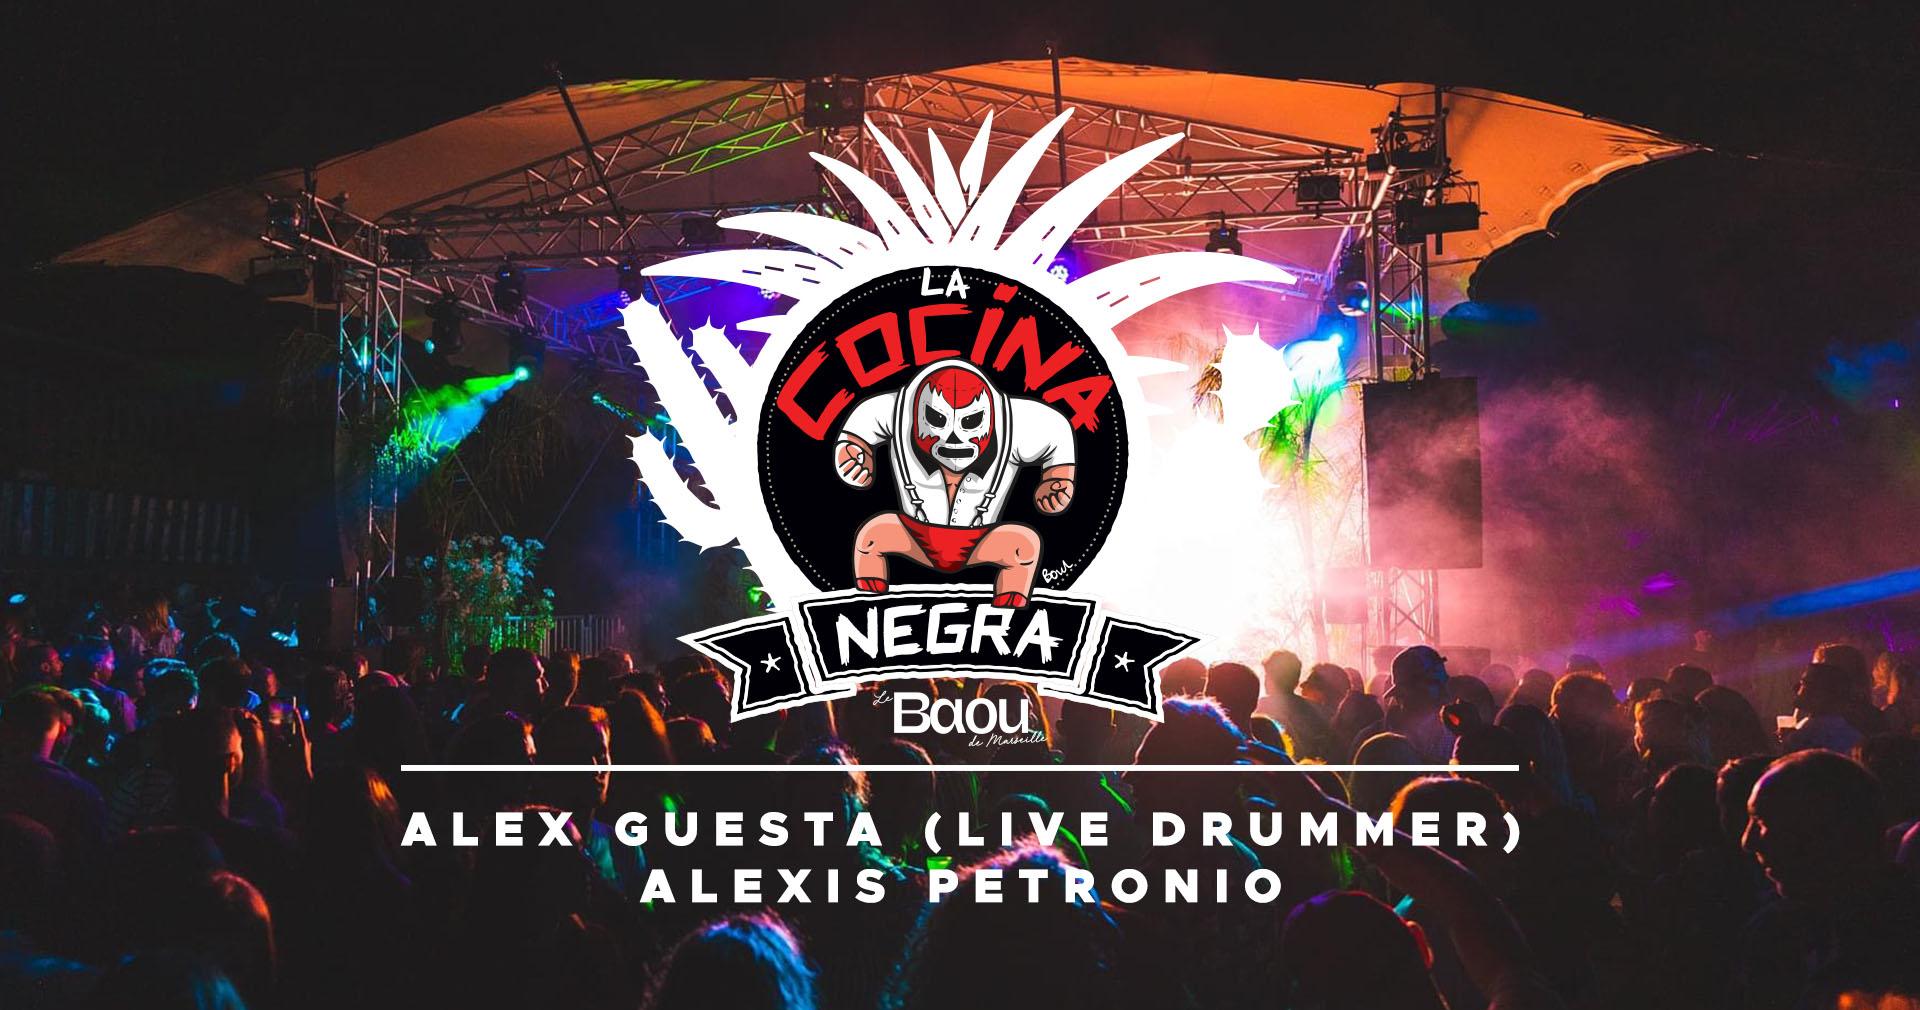 BAOU : La Cocina Negra / Alex guesta (Live drummer) / Alexis petronio